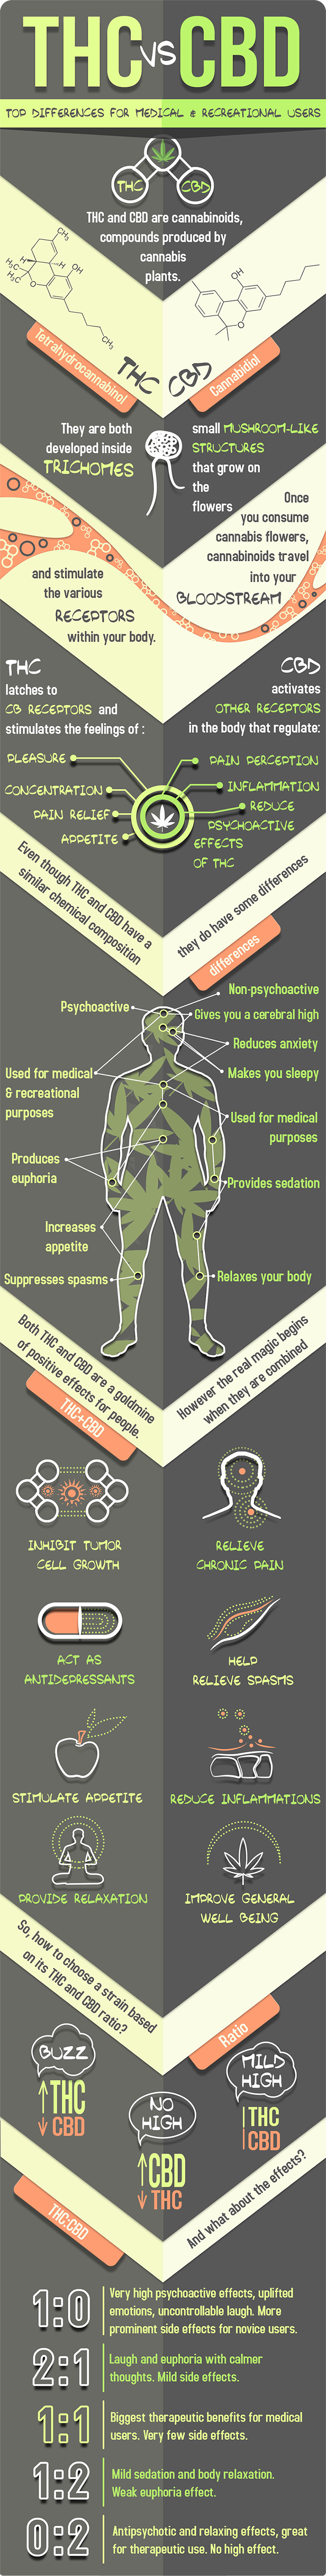 THC-vs-CBD-Infographic-2.png